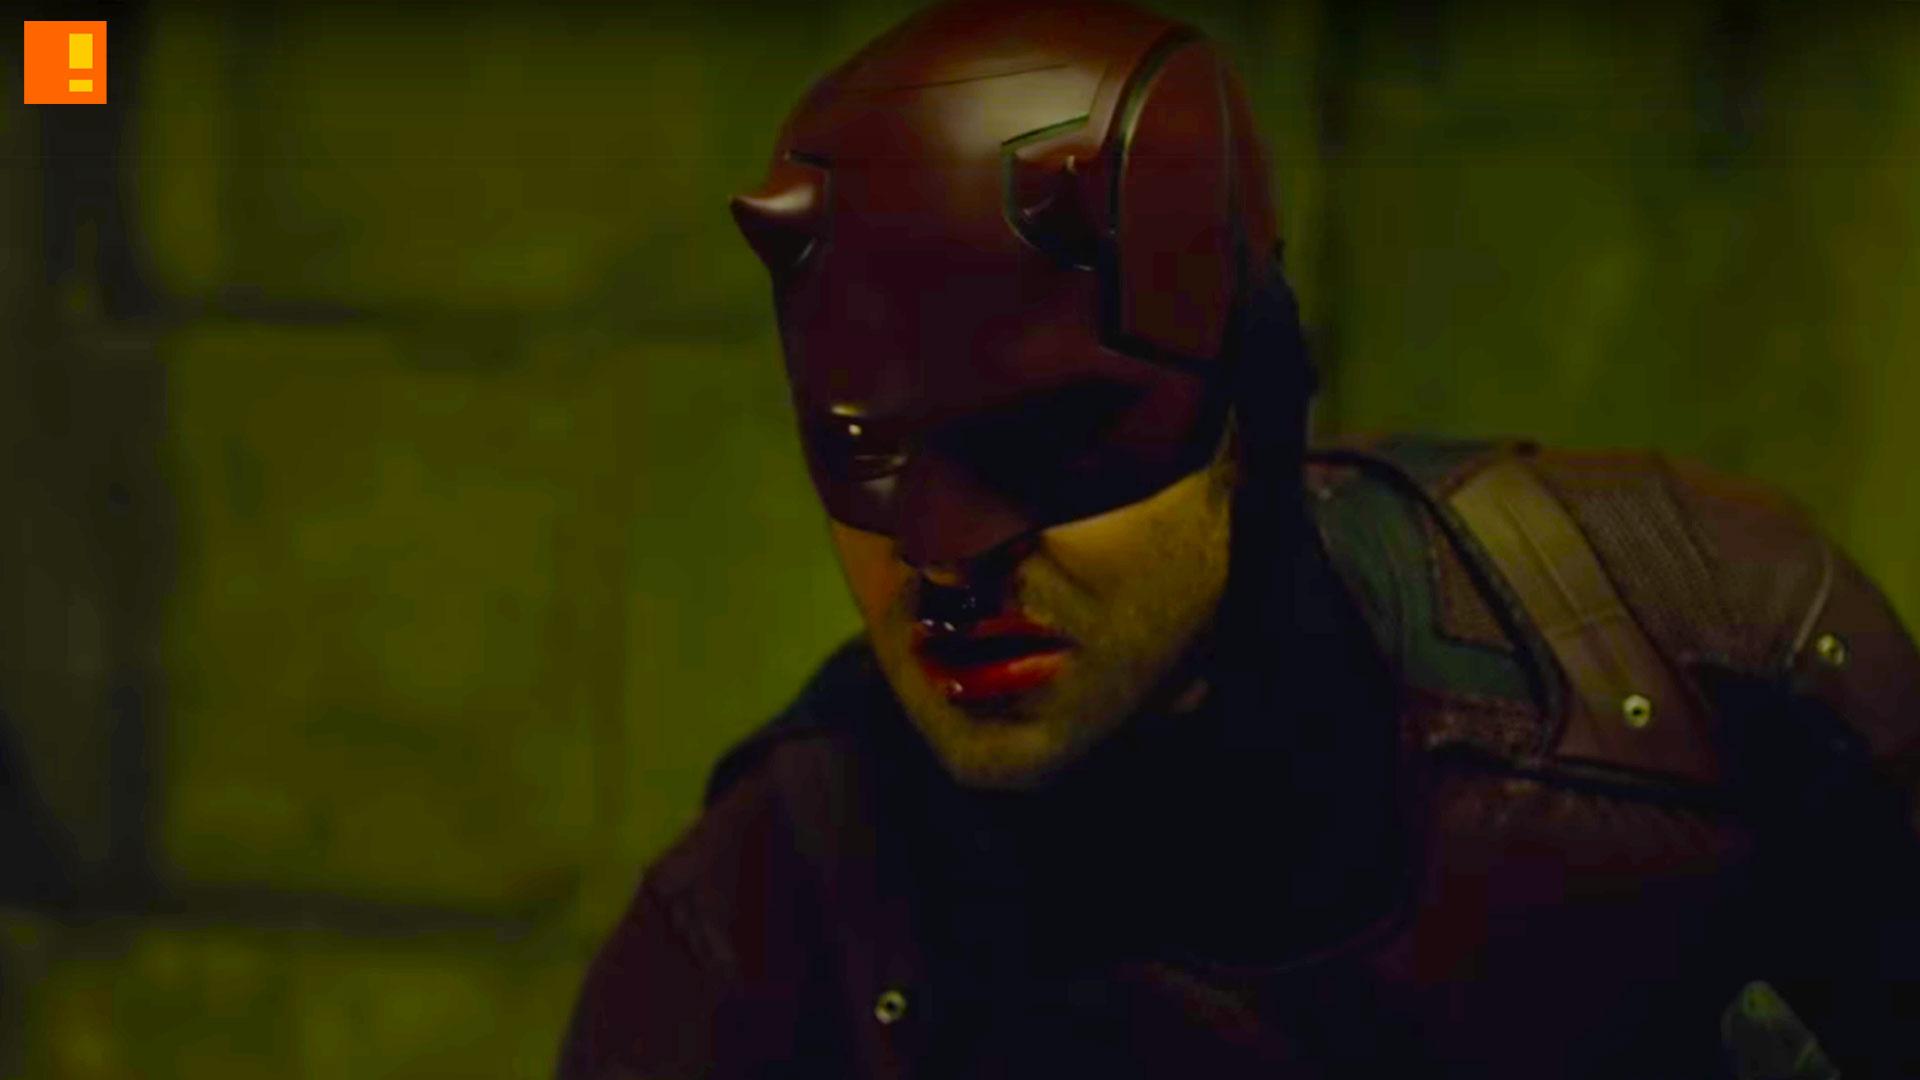 daredevil season 2. netflix. marvel. the action pixel. @theactionpixel